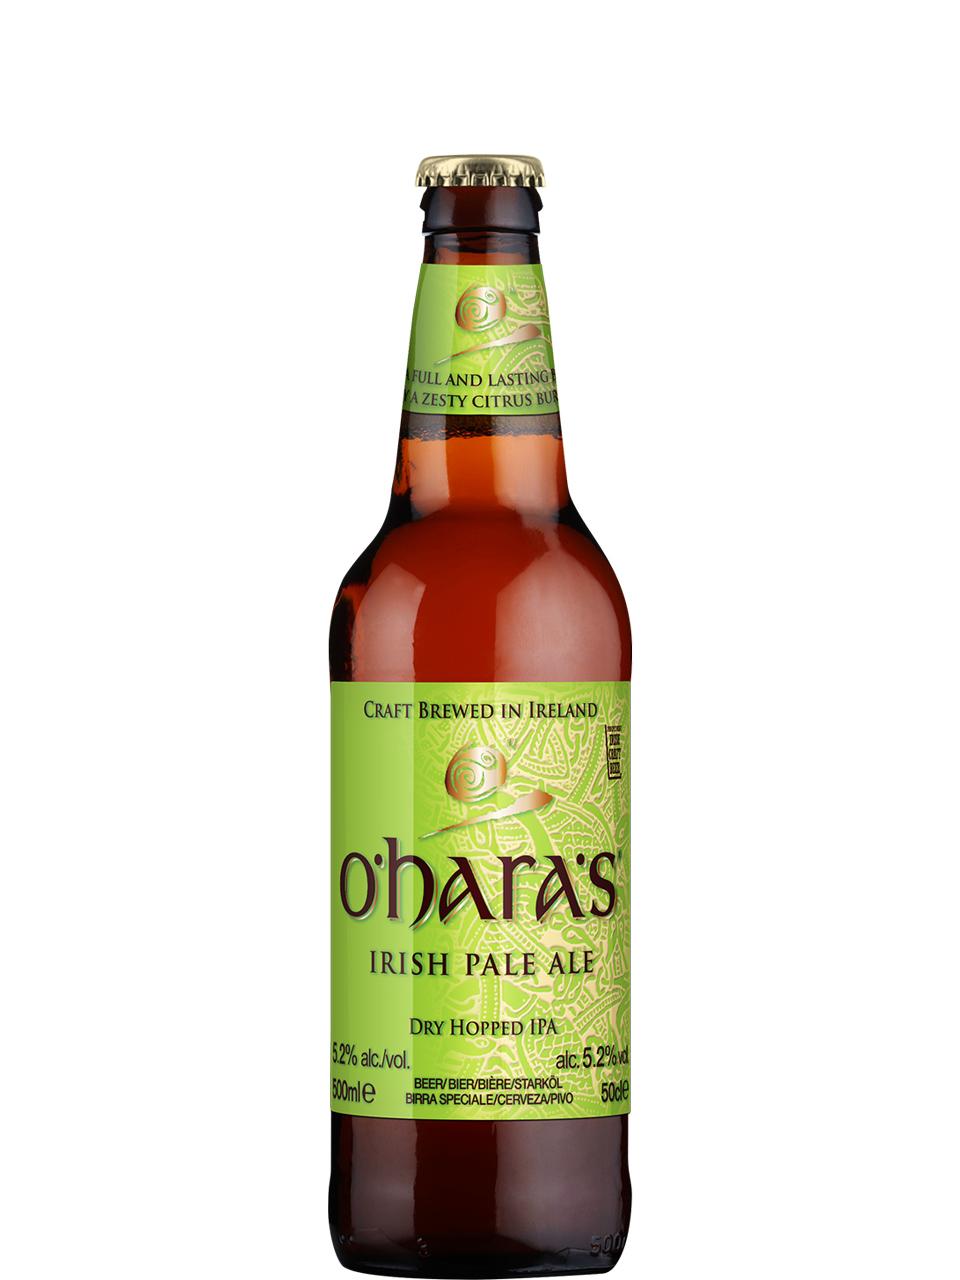 O'hara's Irish Pale Ale 500ml Bottle